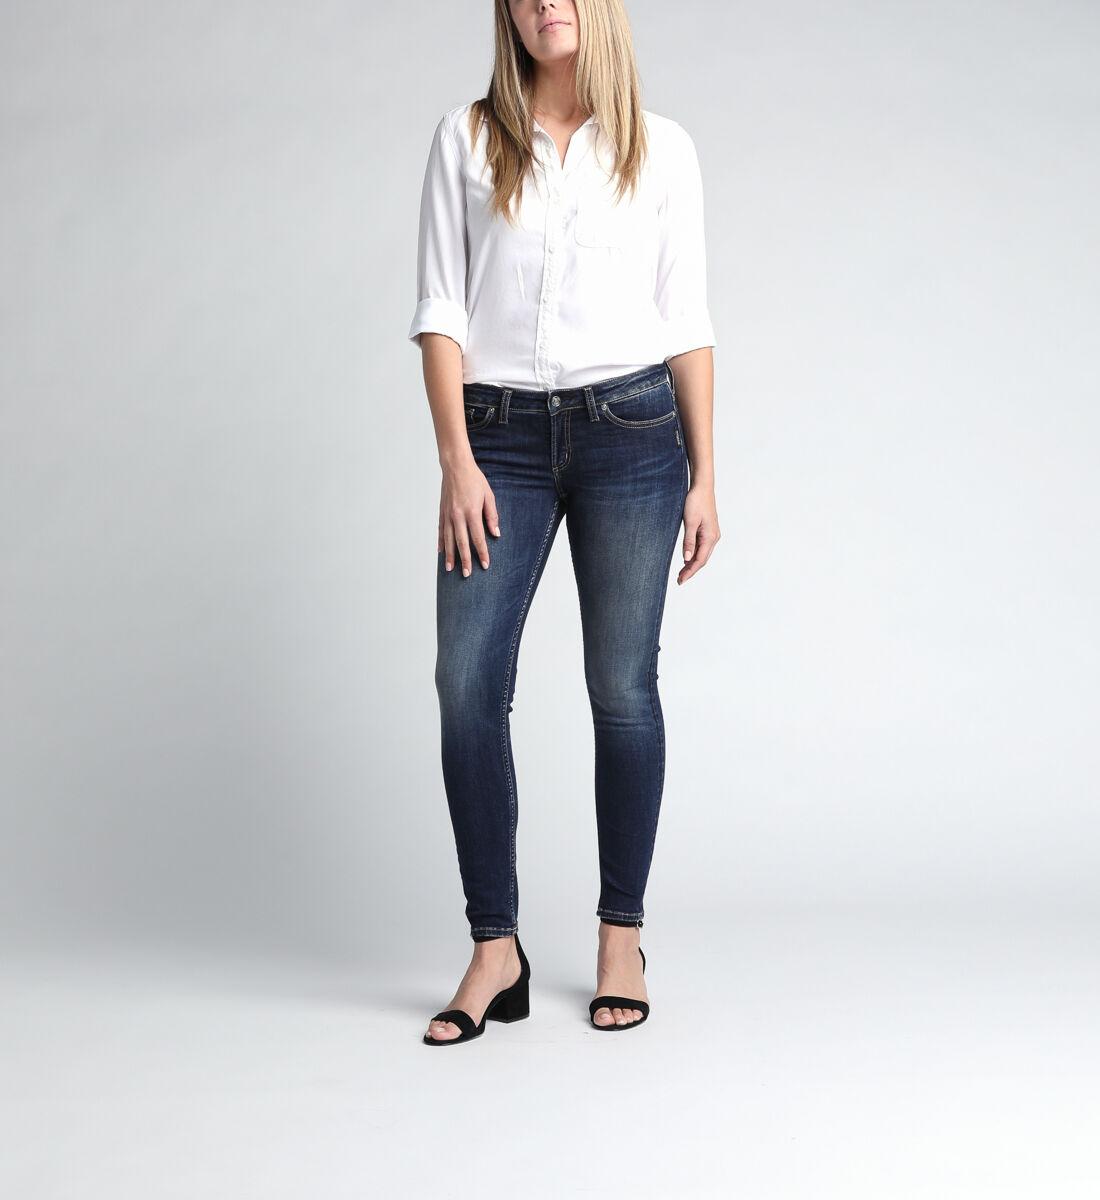 Tuesday Low Rise Skinny Leg Jeans Alt Image 1